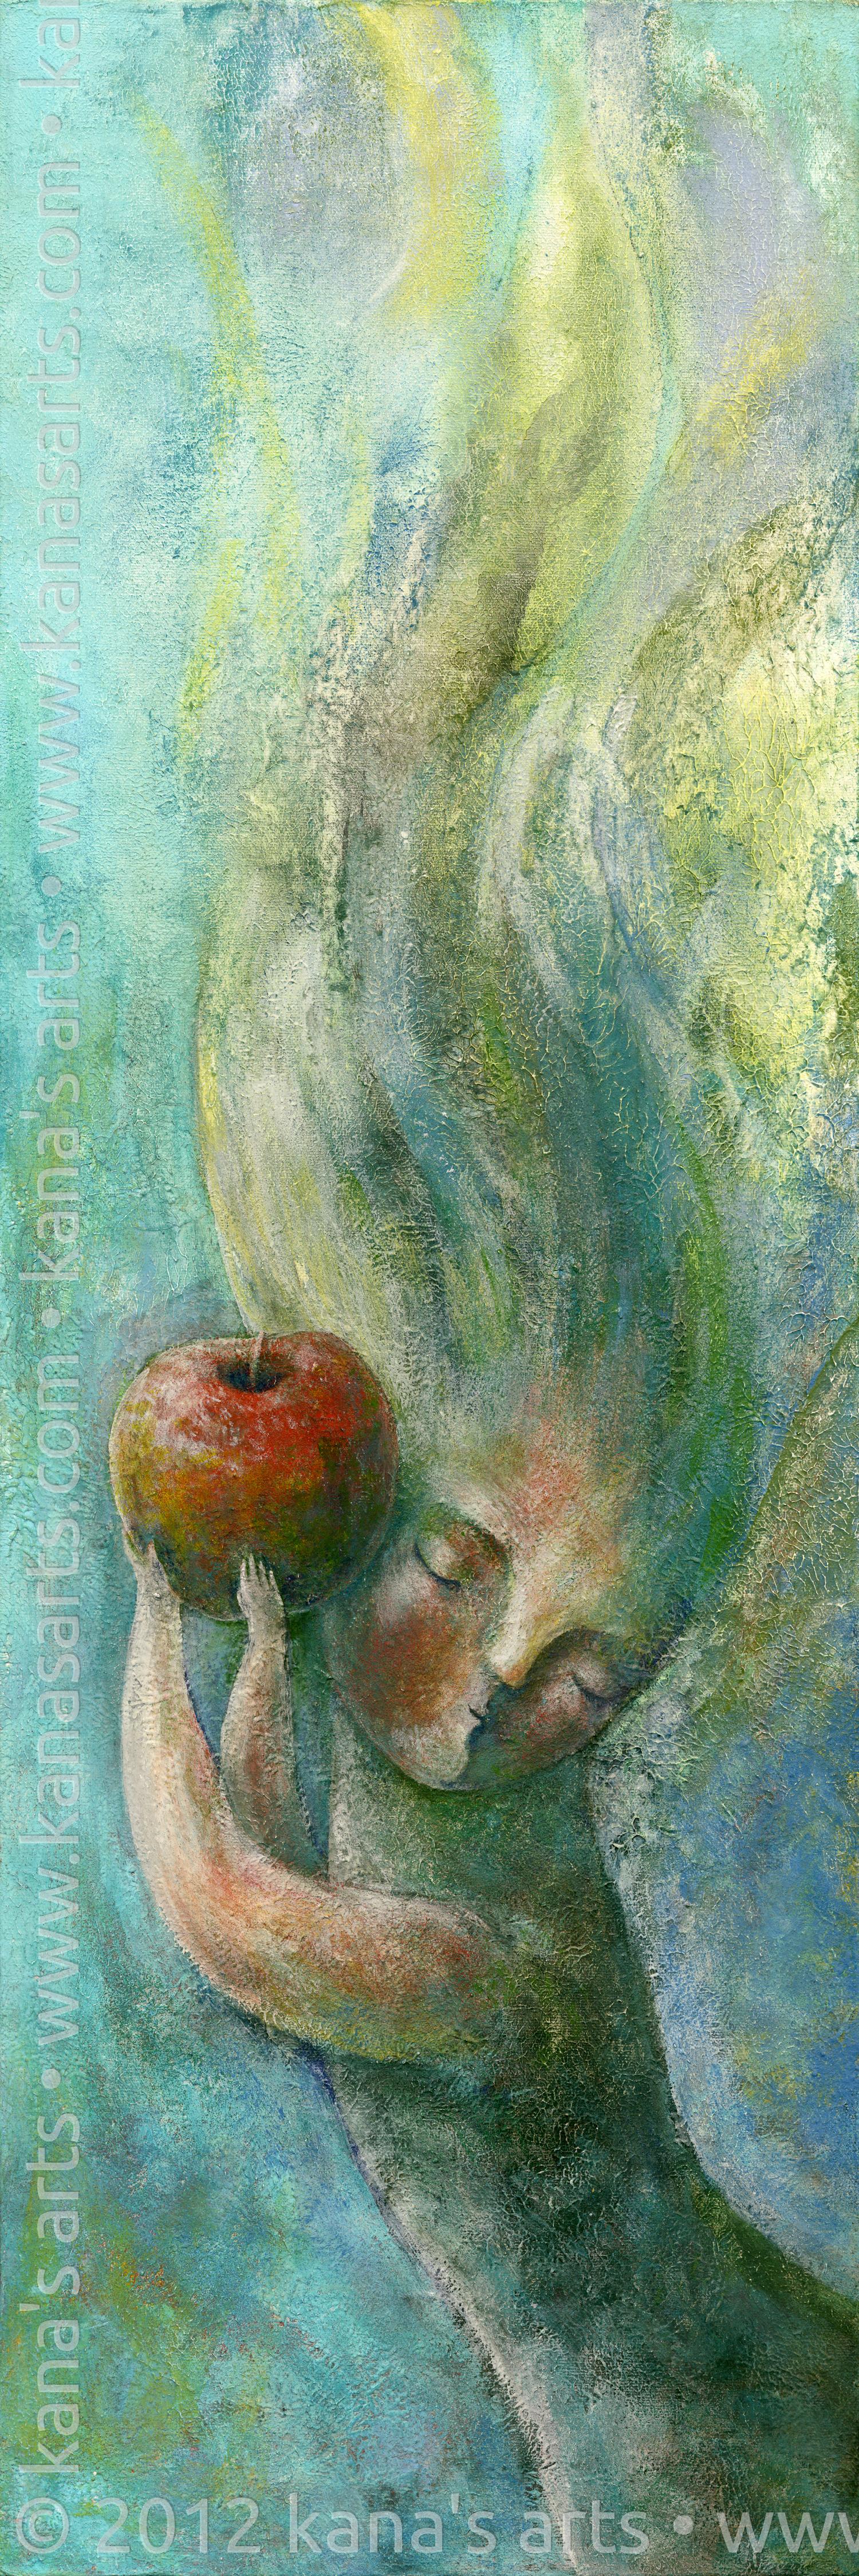 apple for future